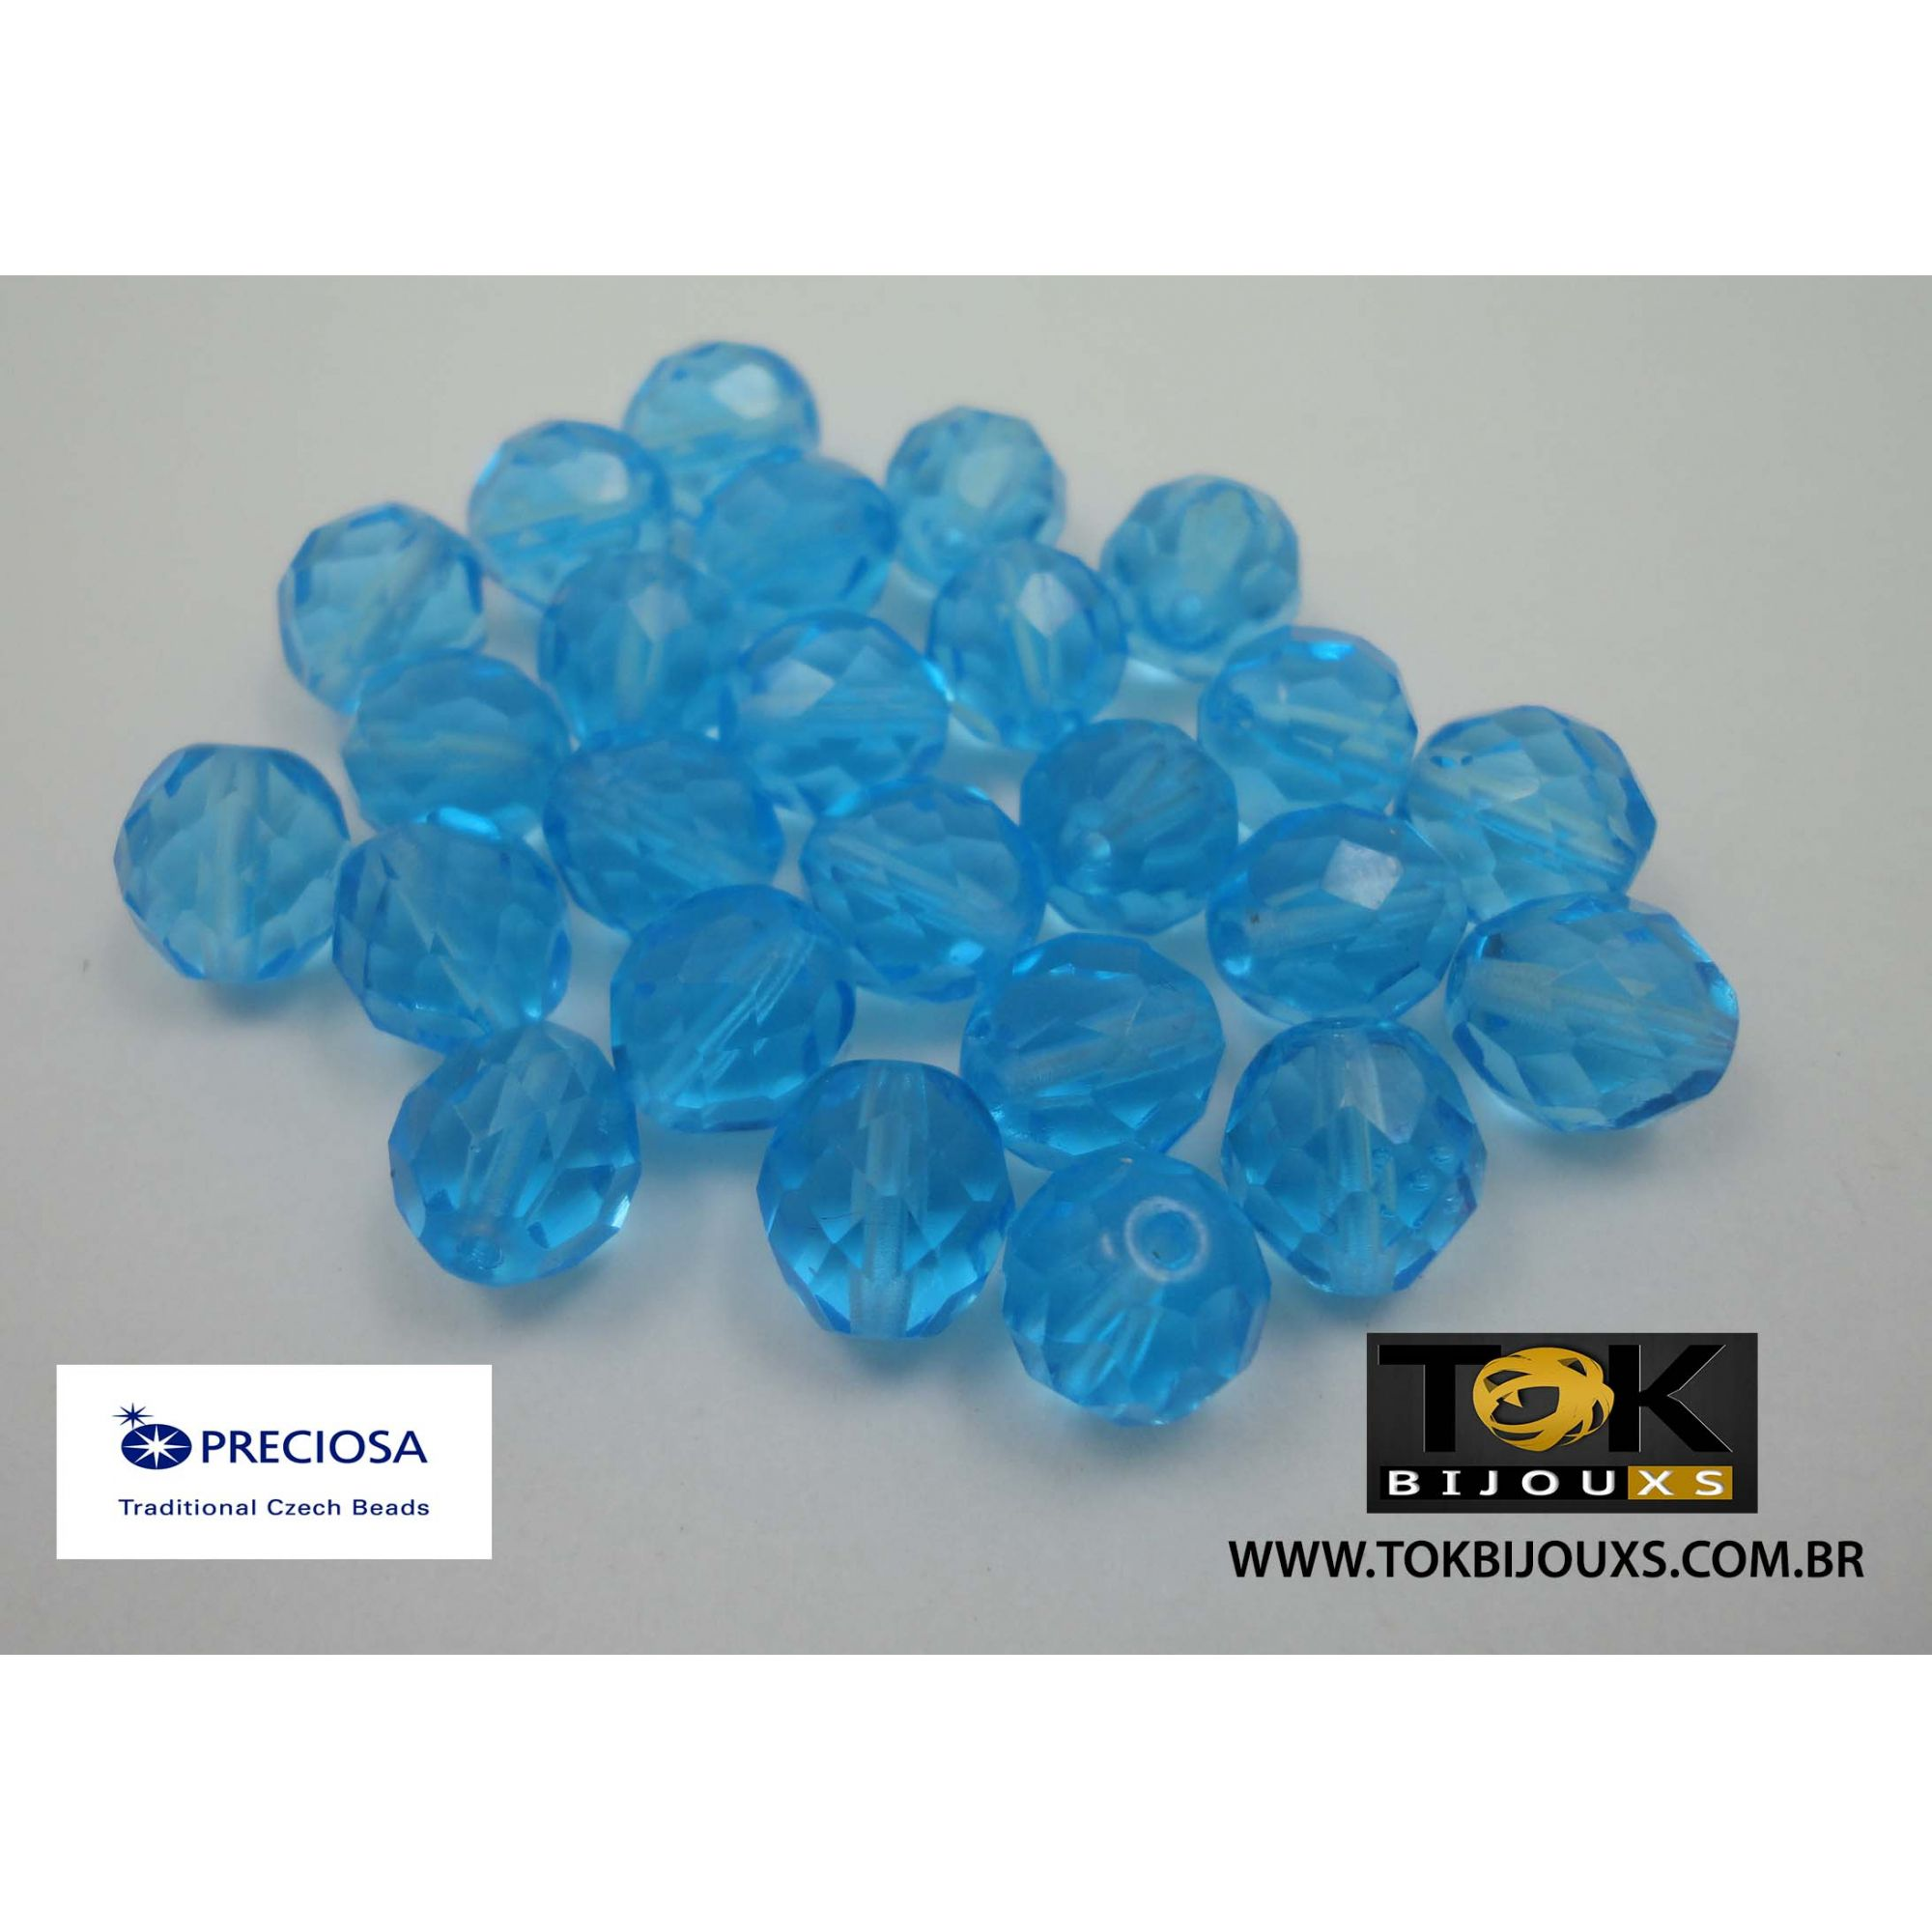 Cristal Jablonex/Preciosa® - Azul Claro Transparente 10mm - 25  Unid